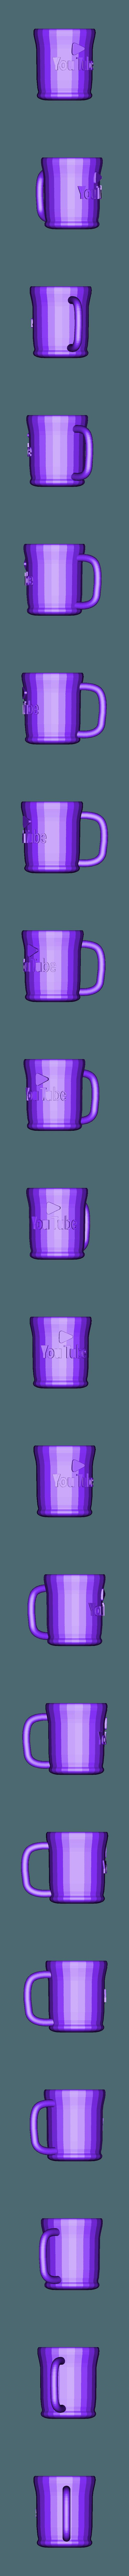 1 obj.obj Download free 3DS file Free You tubers 2020 STL • 3D printer template, ronaldocc13